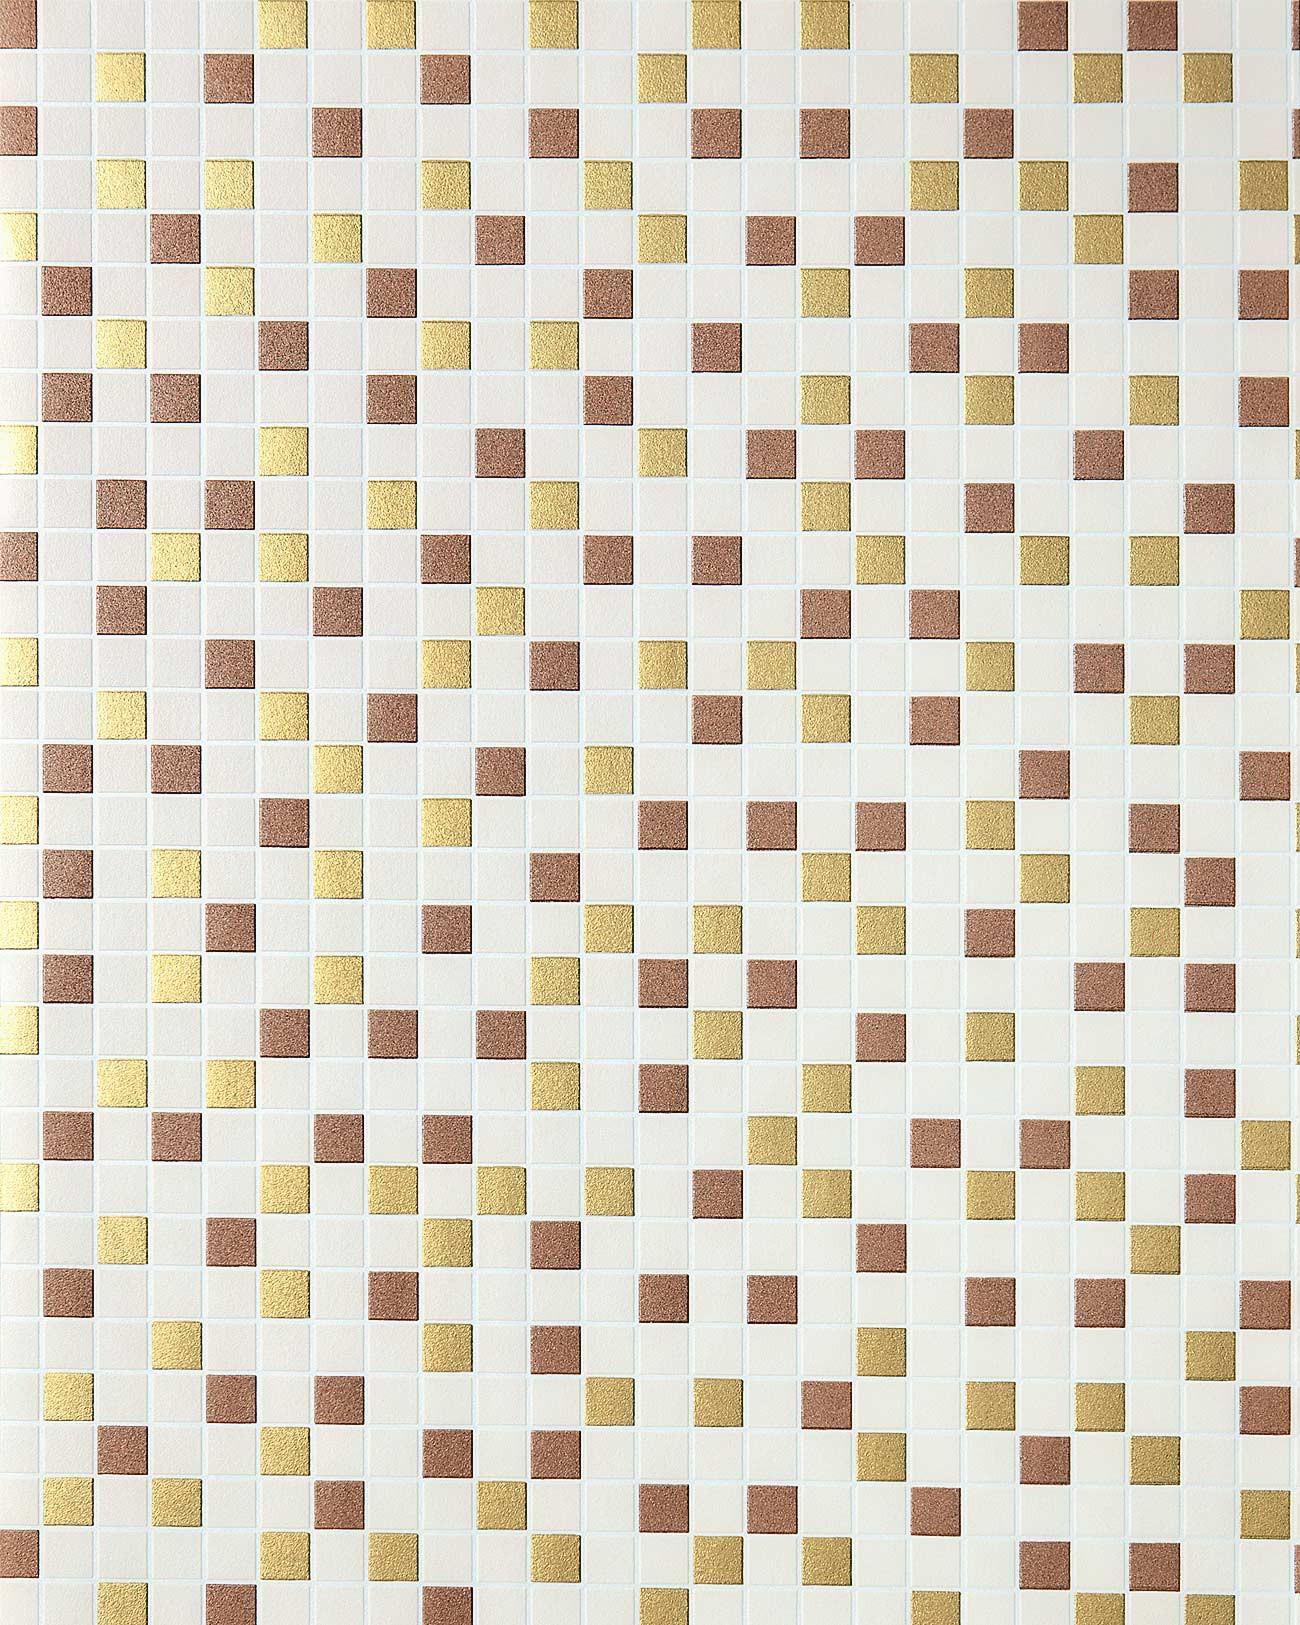 behang design tegel mozaïek edem  structuur vinylbehang, Meubels Ideeën